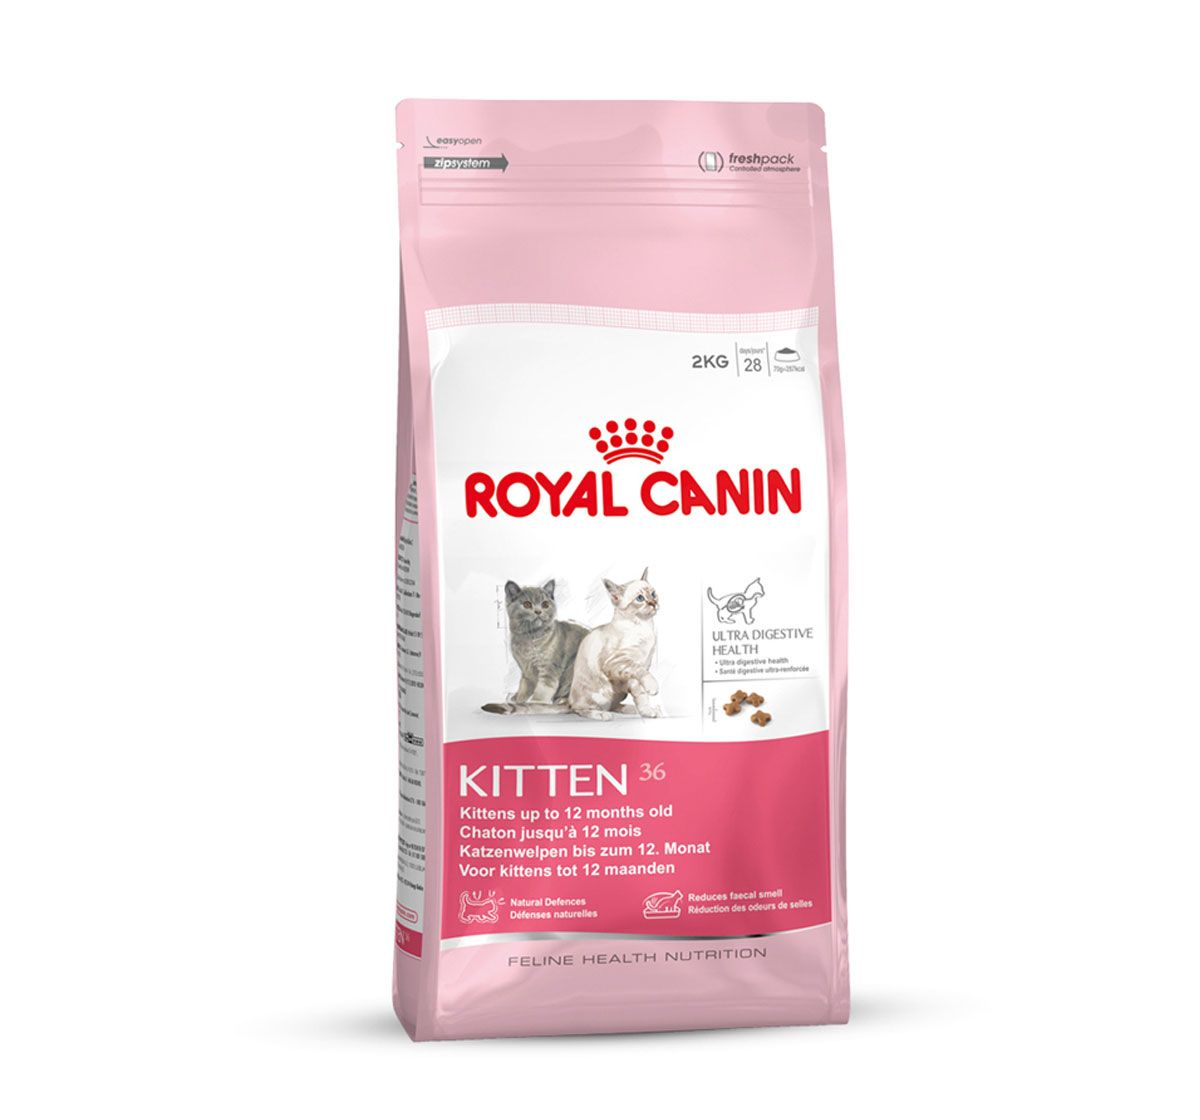 Royal Canin Kitten 400 Gms